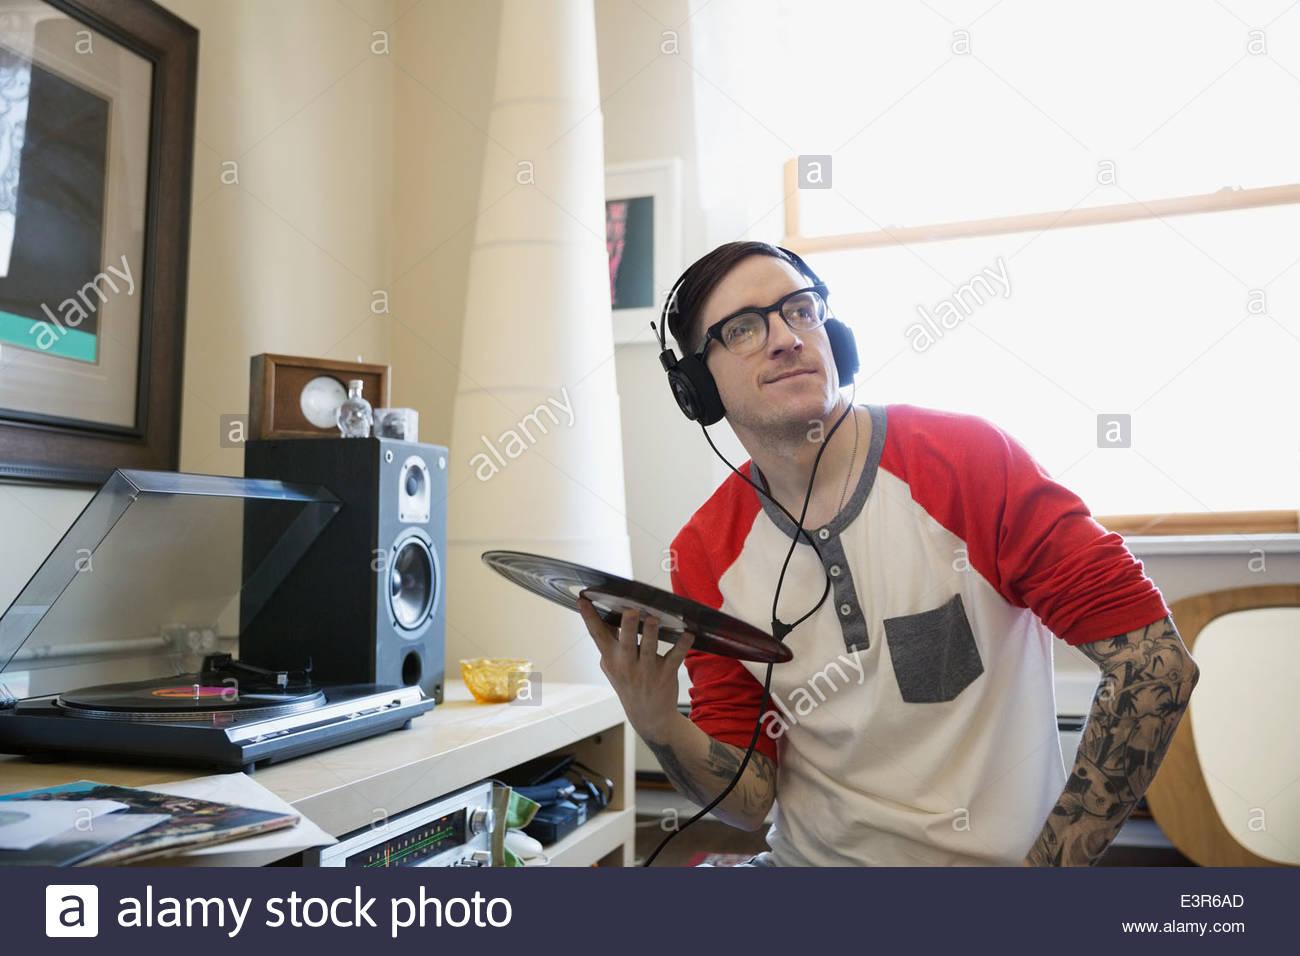 Mann mit Kopfhörern anhören Datensätze Stockbild